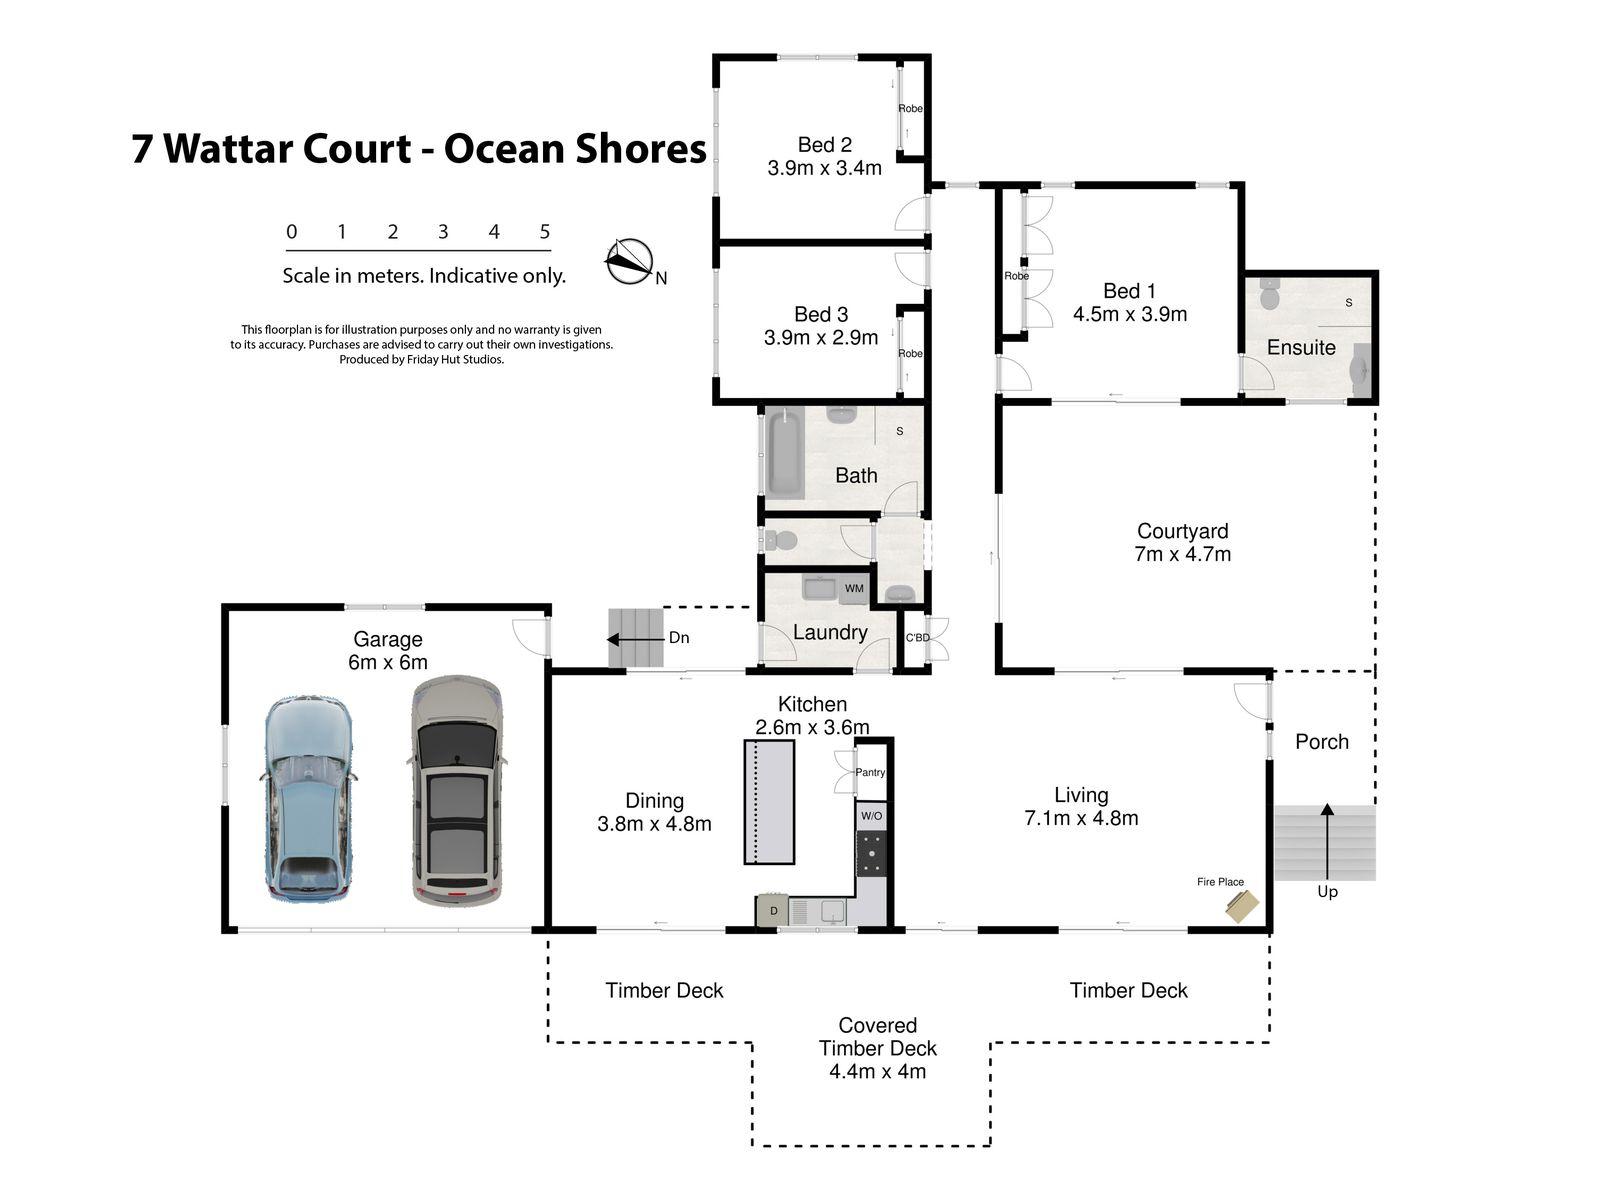 7 Wattar Court, Ocean Shores